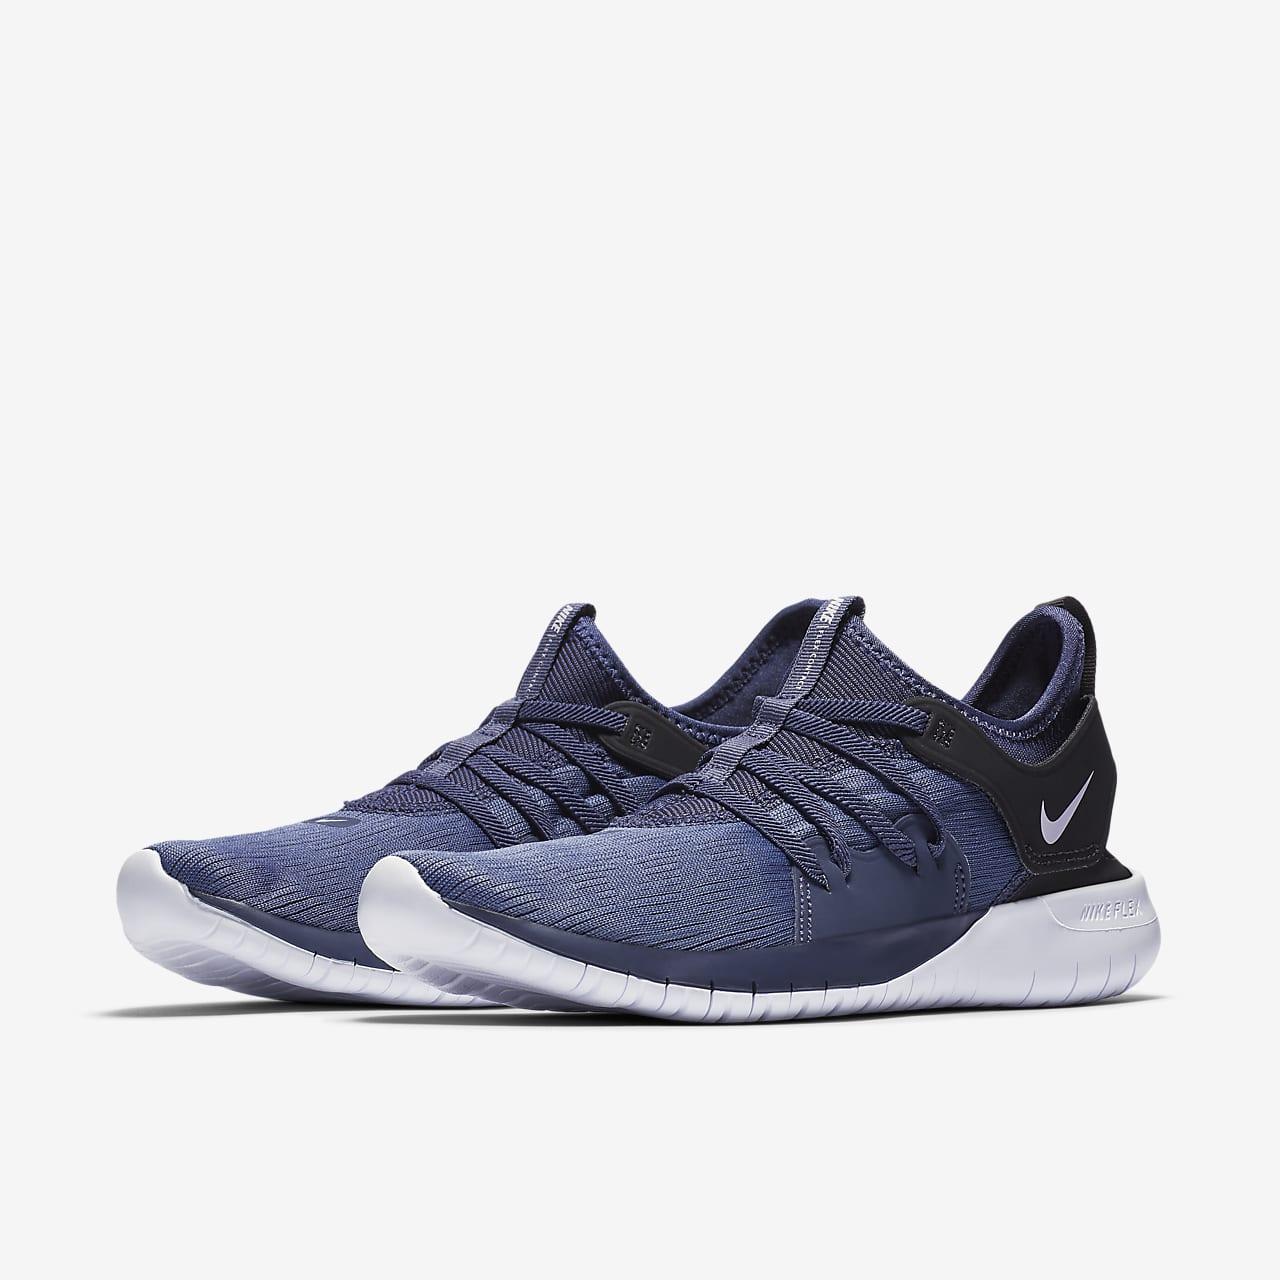 Tantos Accidentalmente Ópera  Nike Flex Contact 3 Women's Running Shoe. Nike ID